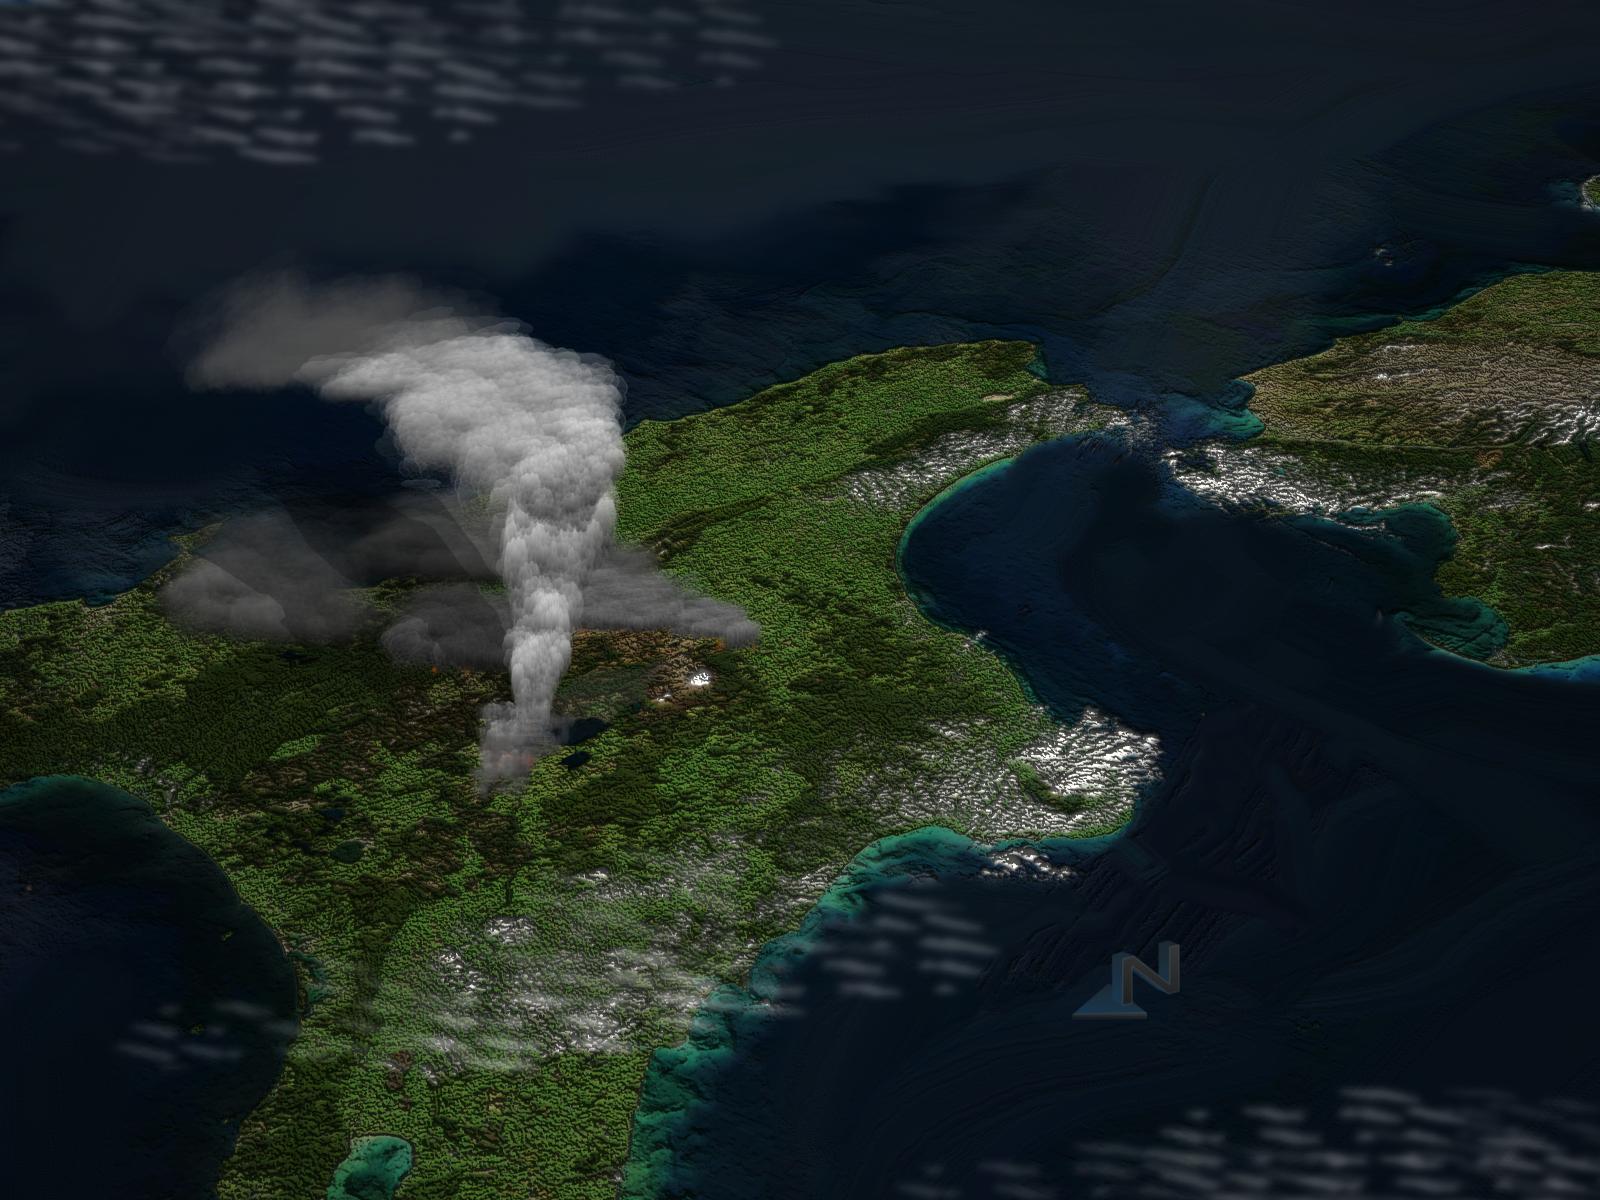 Oruanui New Zealand  city photos : oruanui eruption the oruanui eruption of new zealand s taupo volcano ...